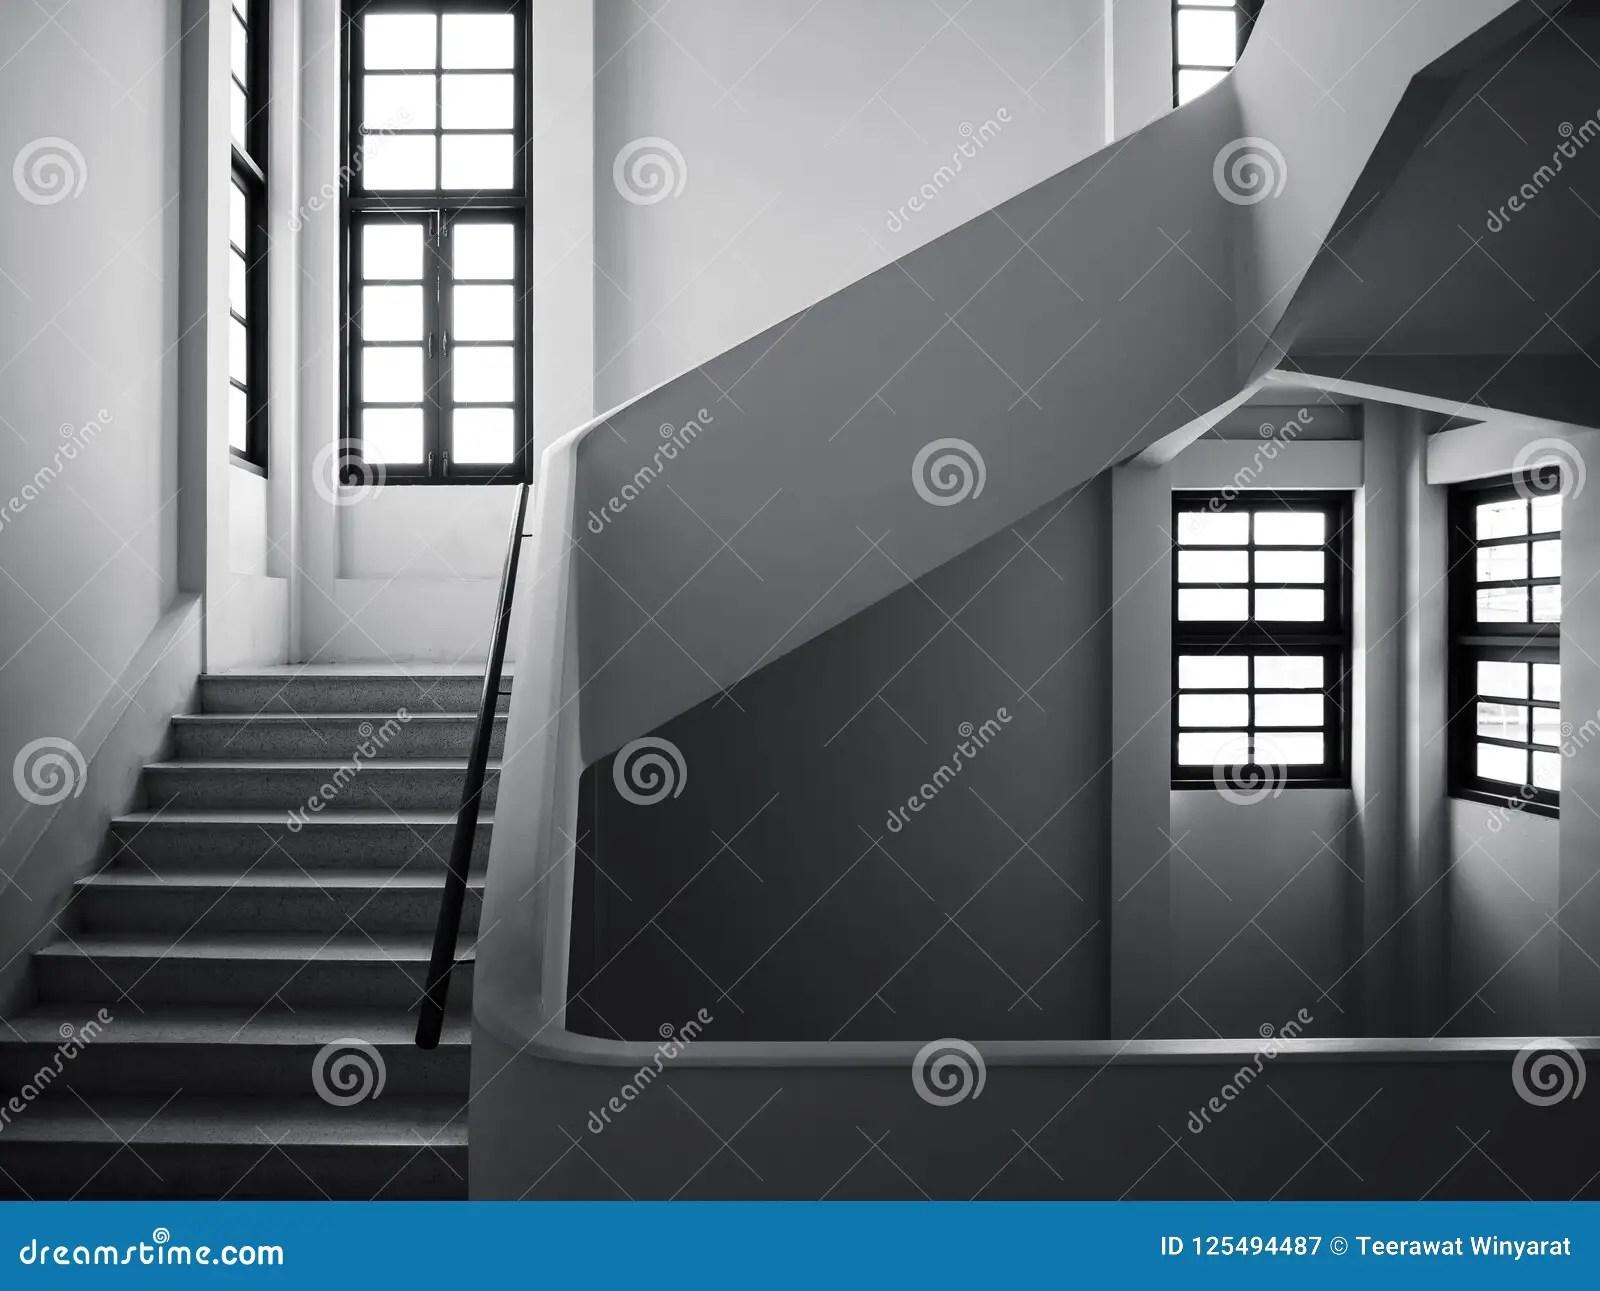 Staircase With Window Frame Interior Building Hallway Stock Image | Window Design For Stairs | Stylish | House Box Window | U Shaped | Big Window | Luxury Window